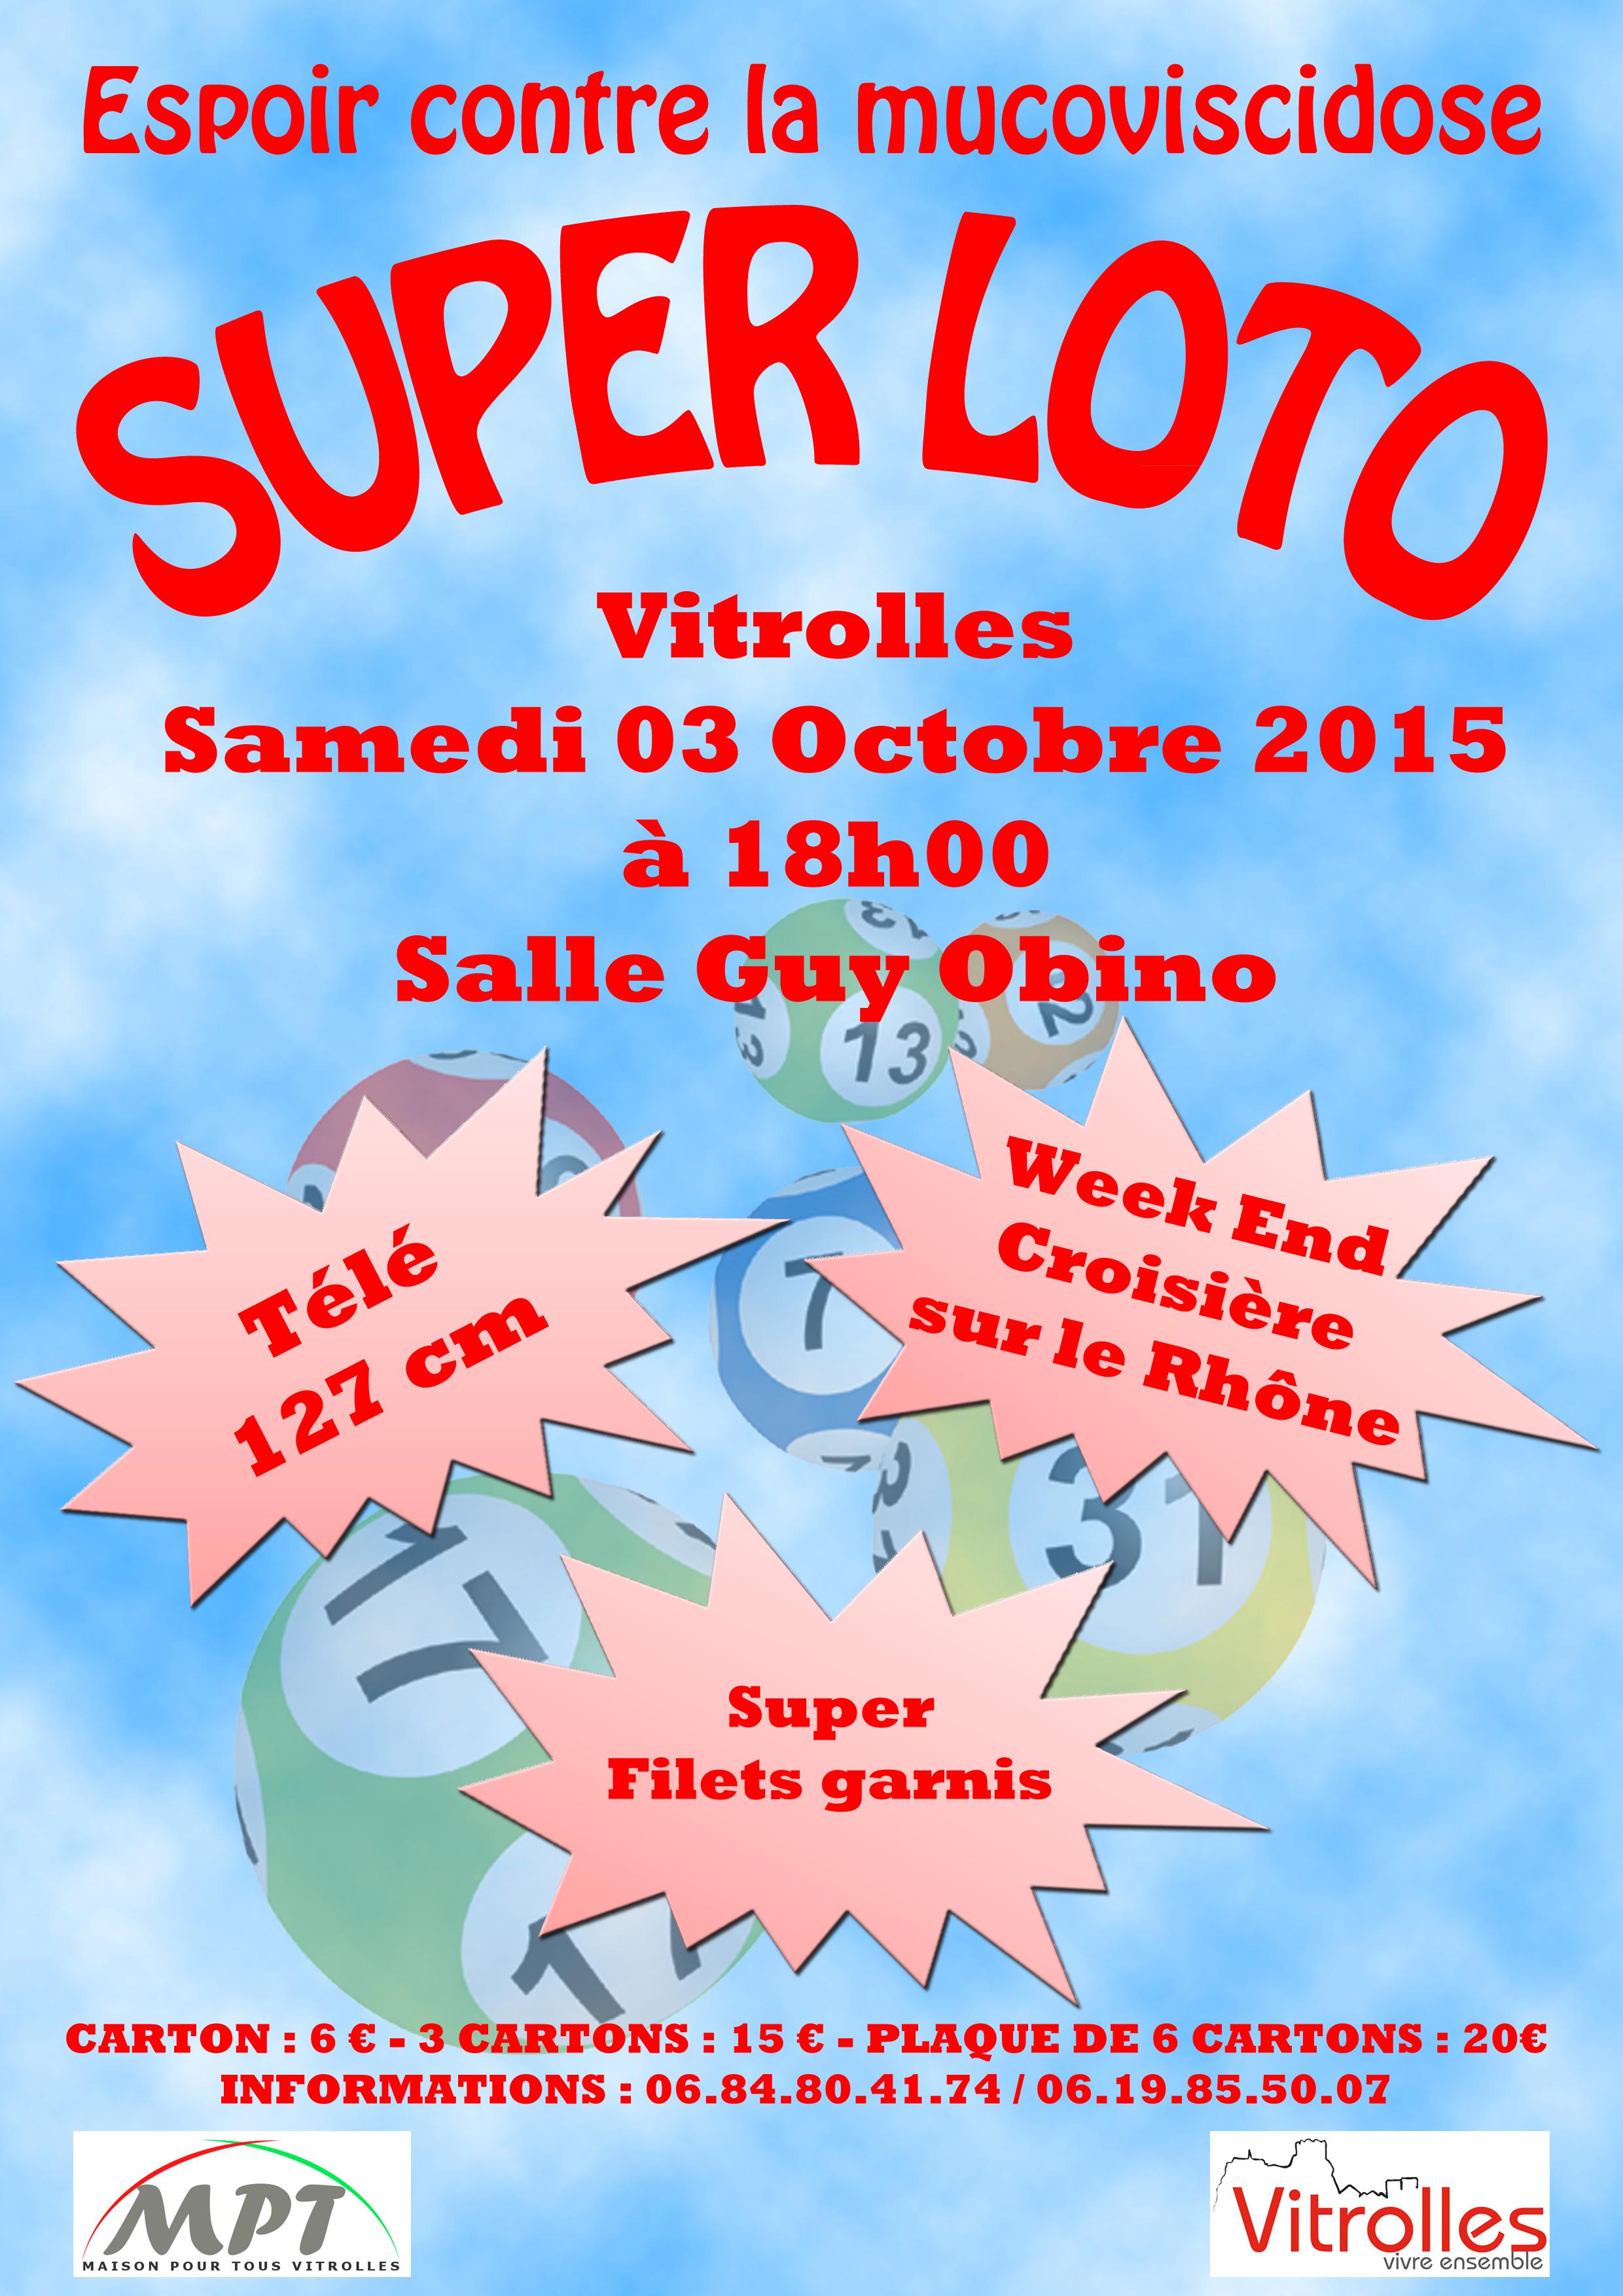 Samedi 3 Octobre : 18 heures – LOTO a Vitrolles Salle des Fêtes Guy Obino